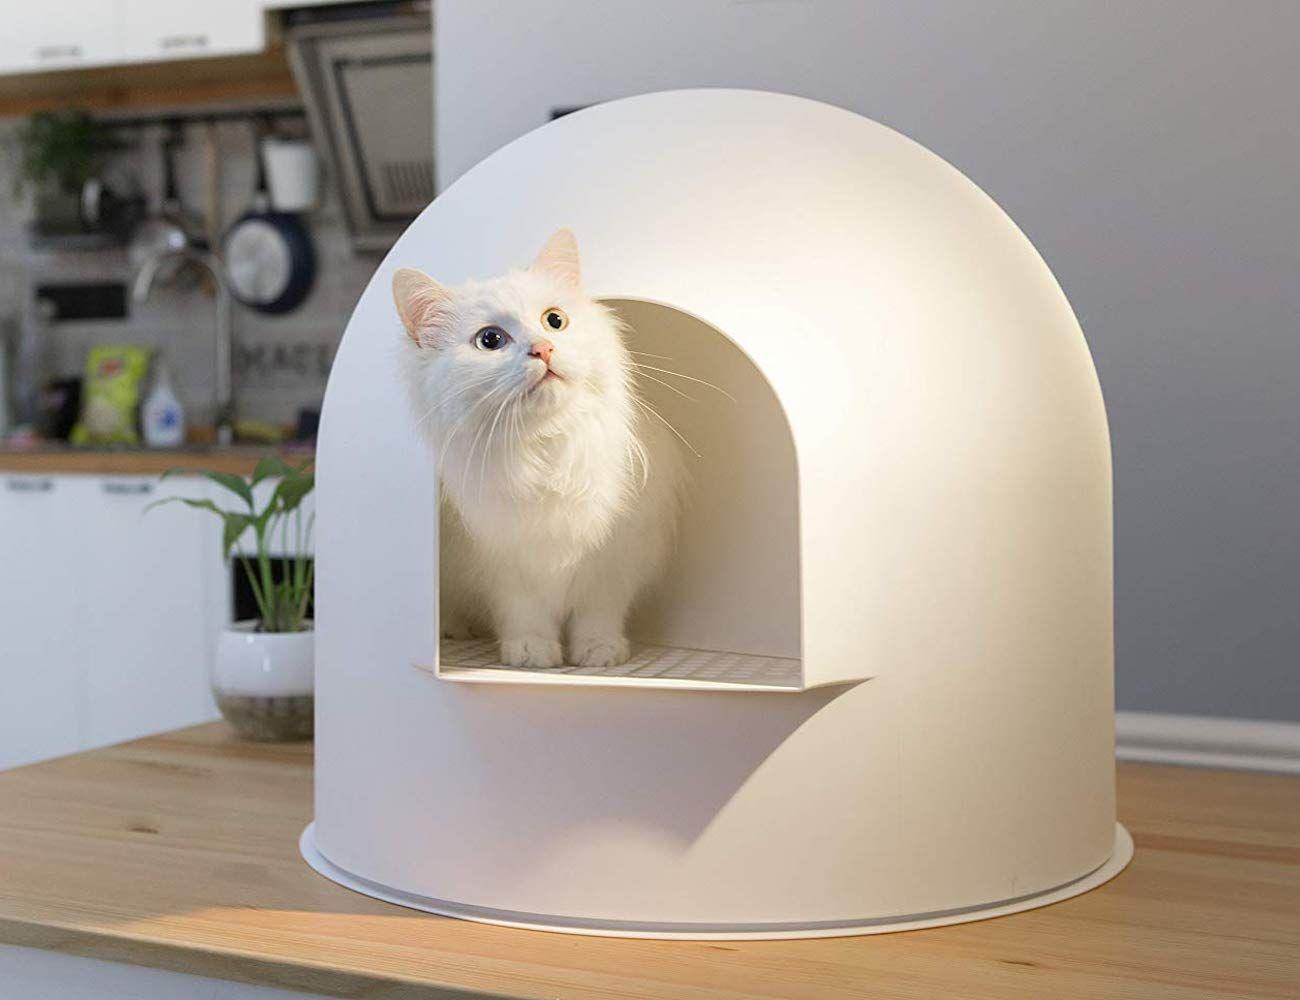 Pidan Snow House Igloo Cat Litter Box Cat Litter Box Cat Training Litter Box Litter Box